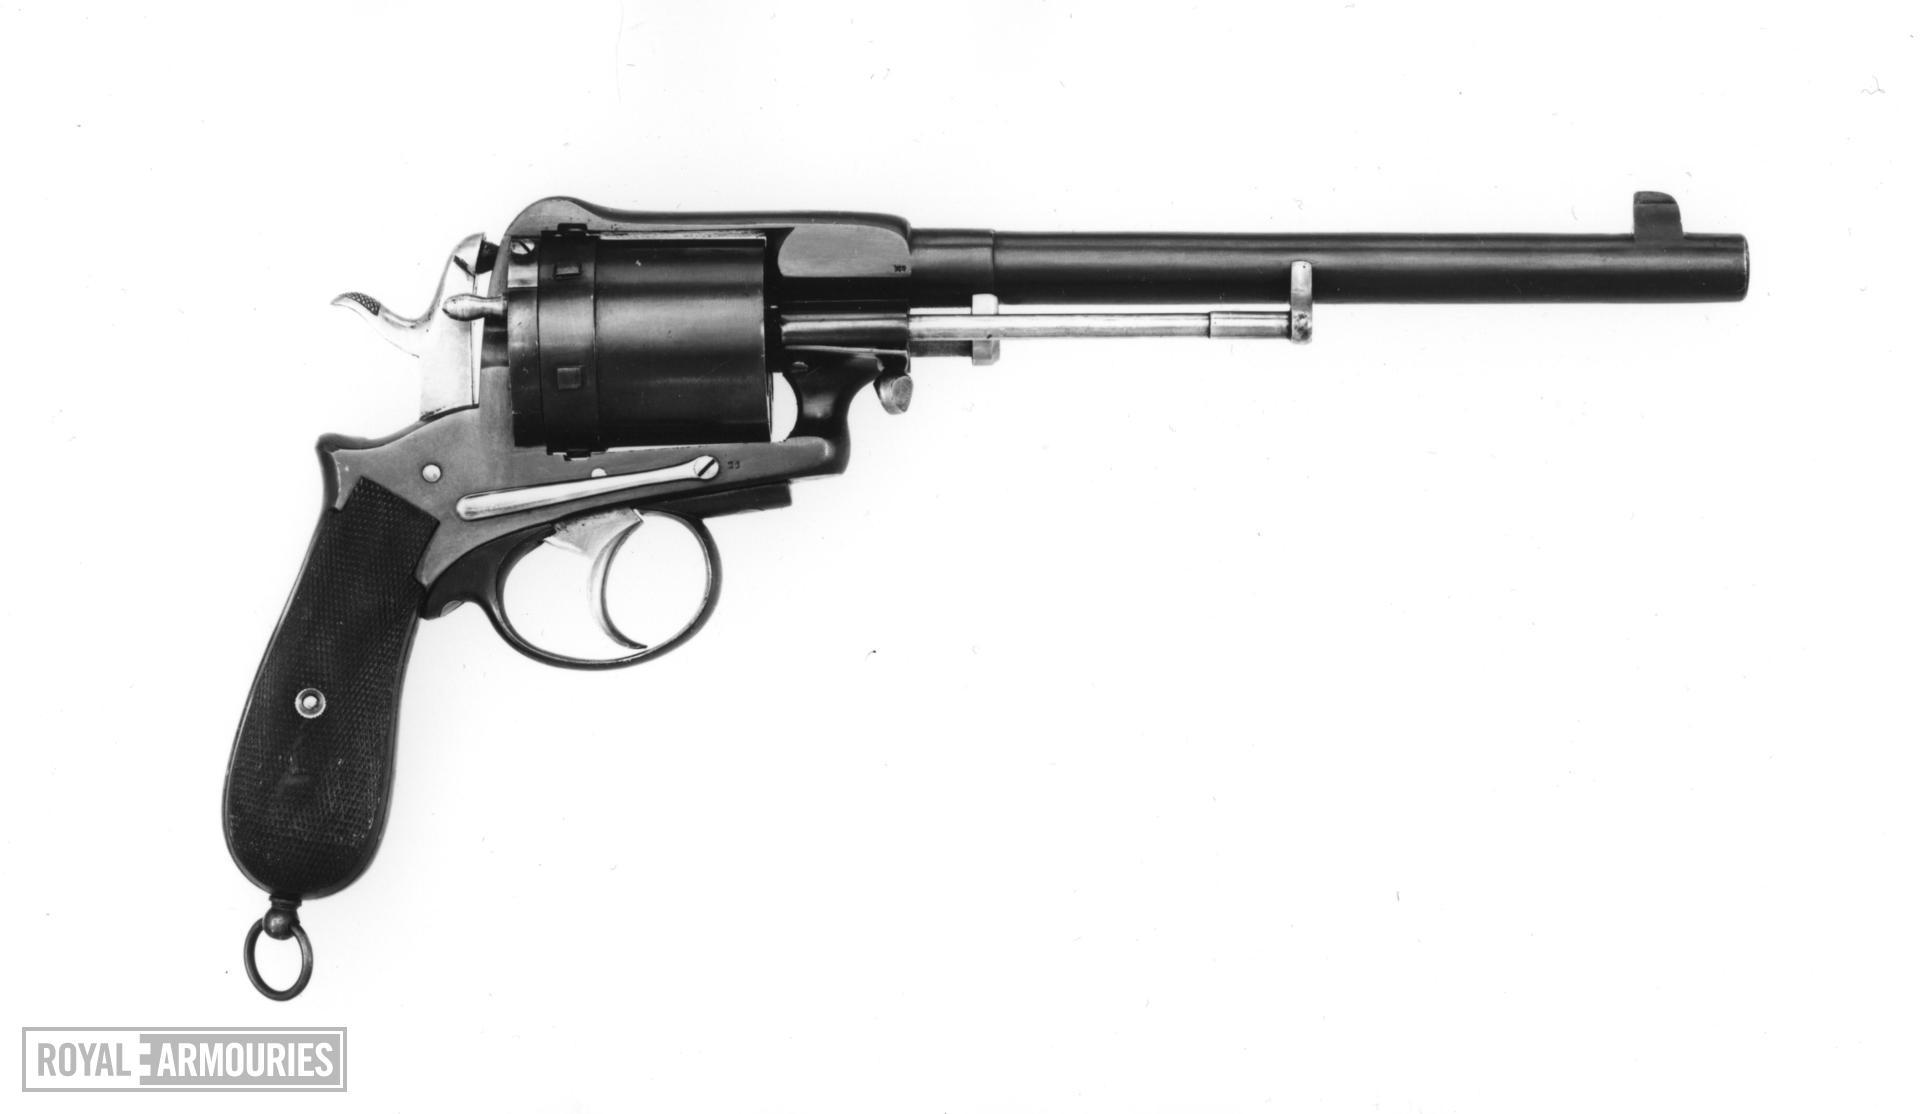 Centrefire six-shot revolver - Gasser